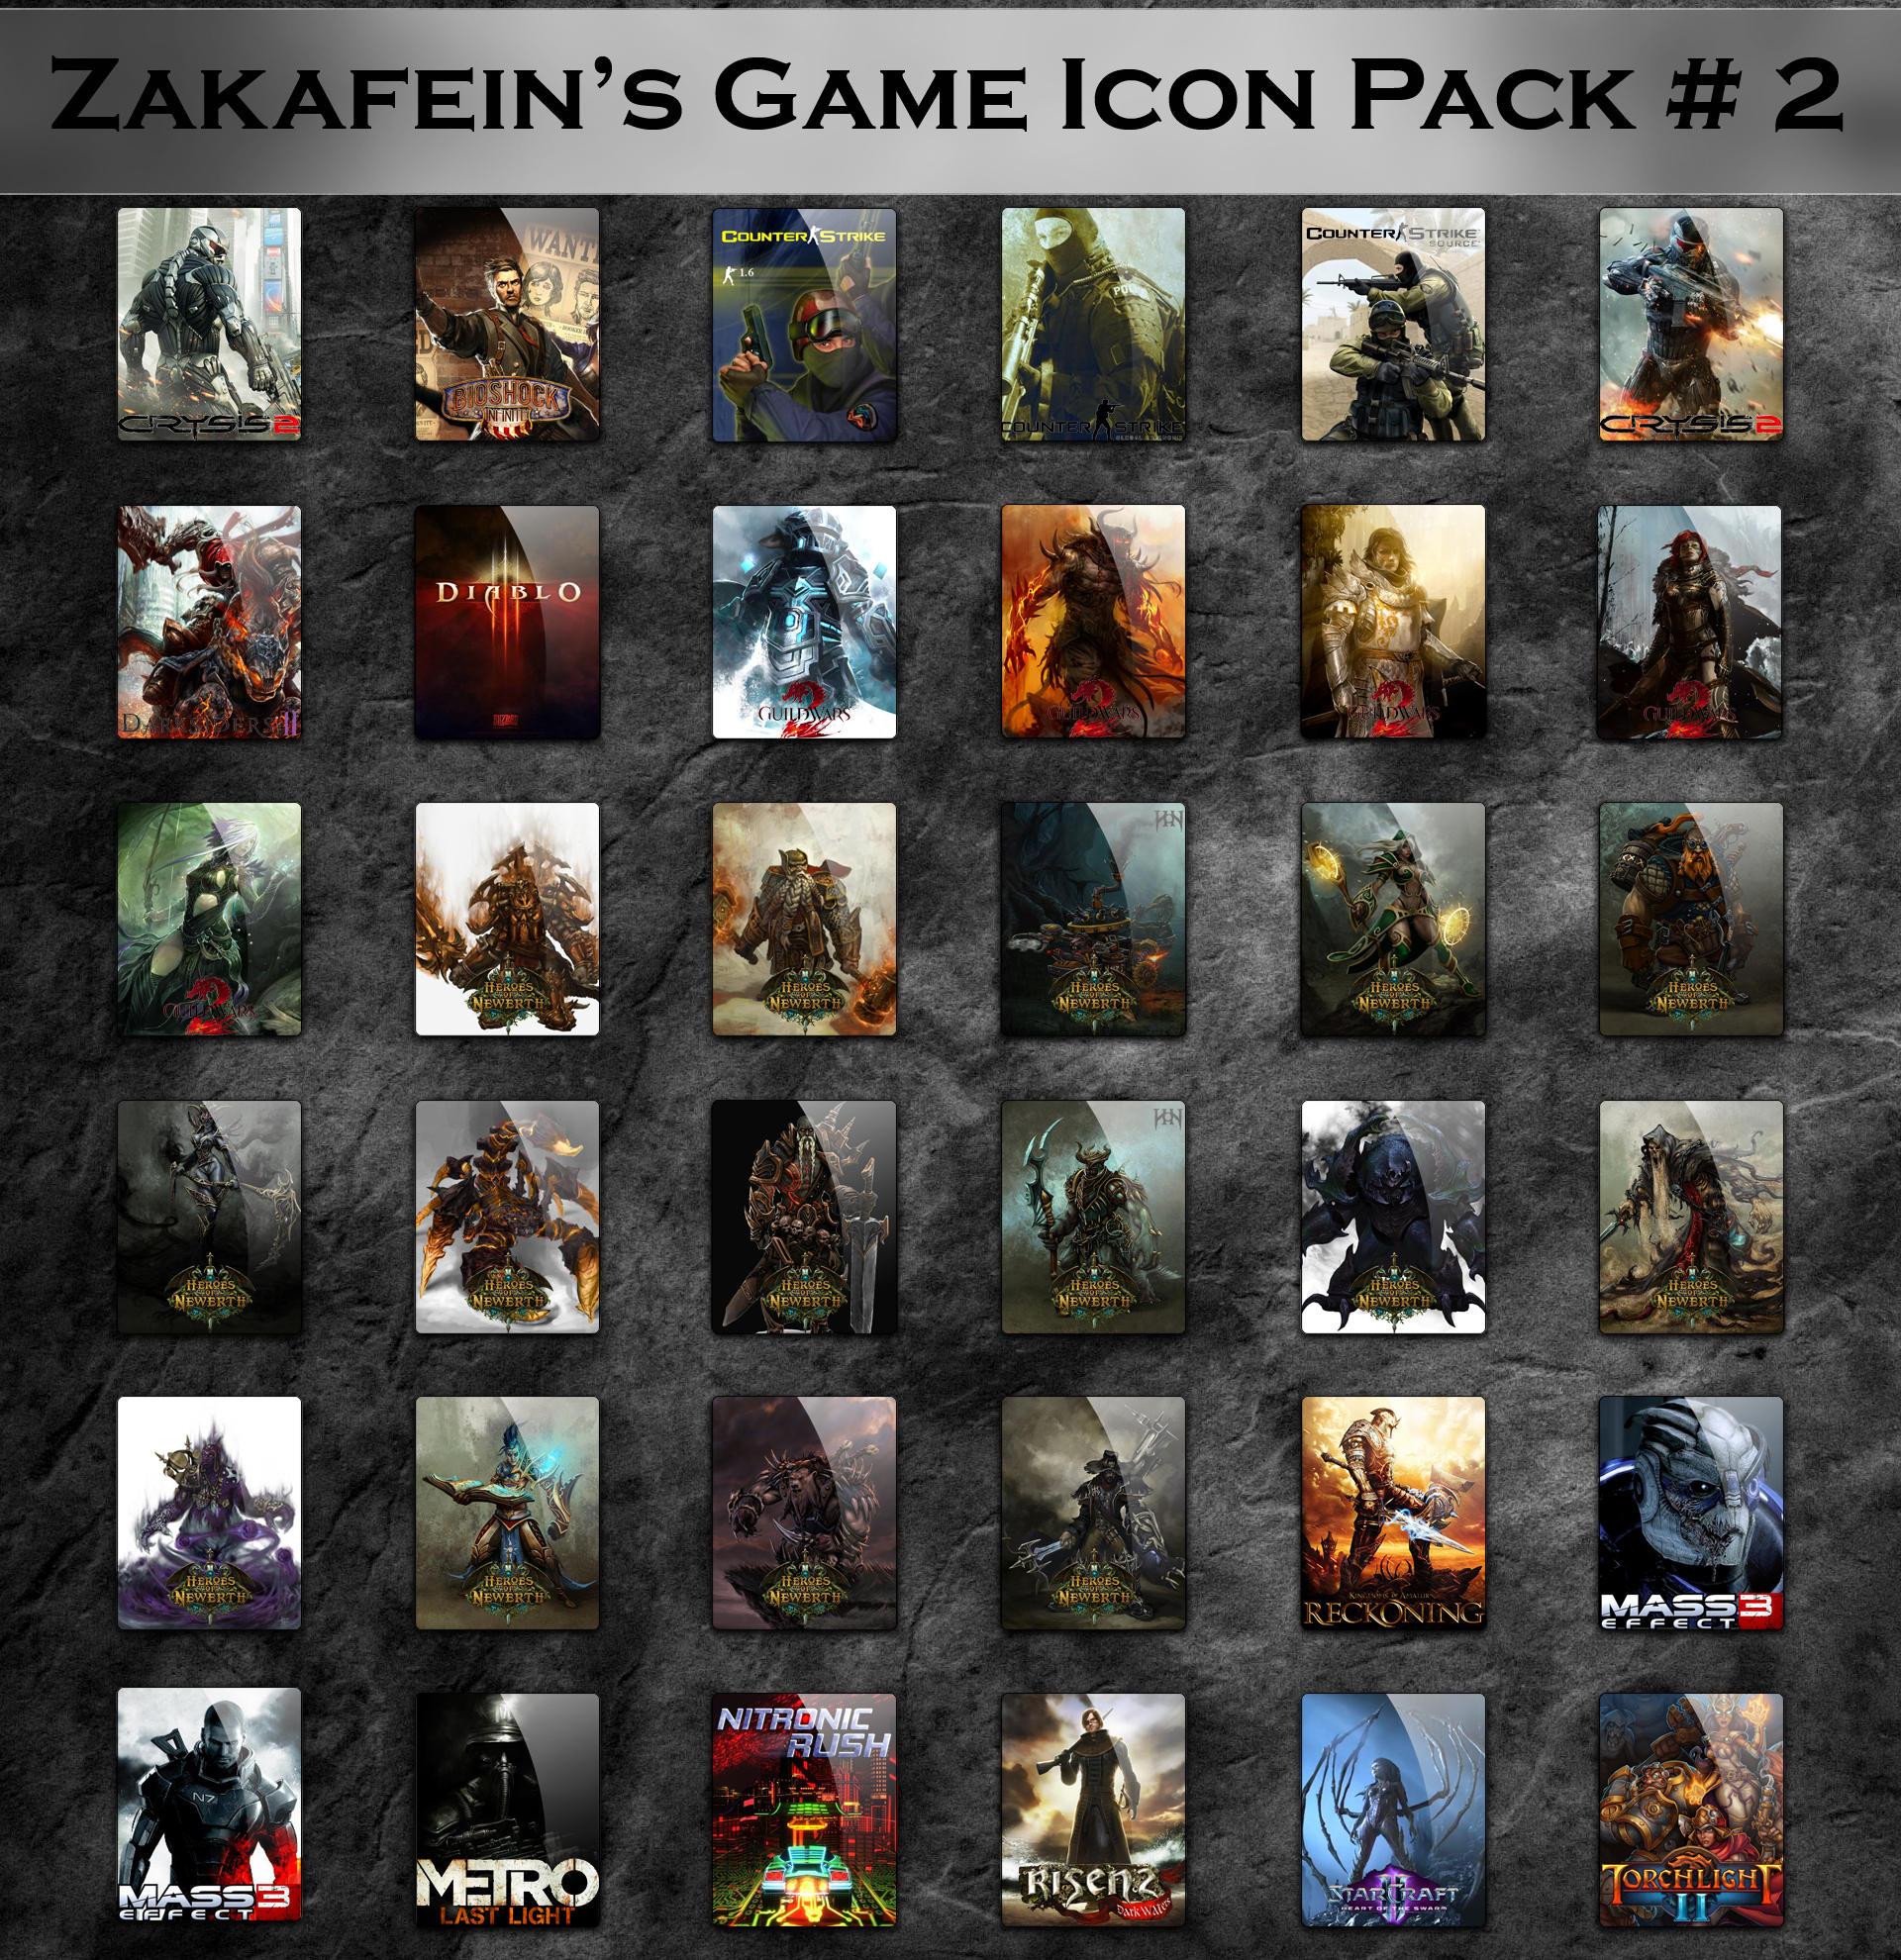 Zakafein's Game Icon Pack 2 by Zakafein